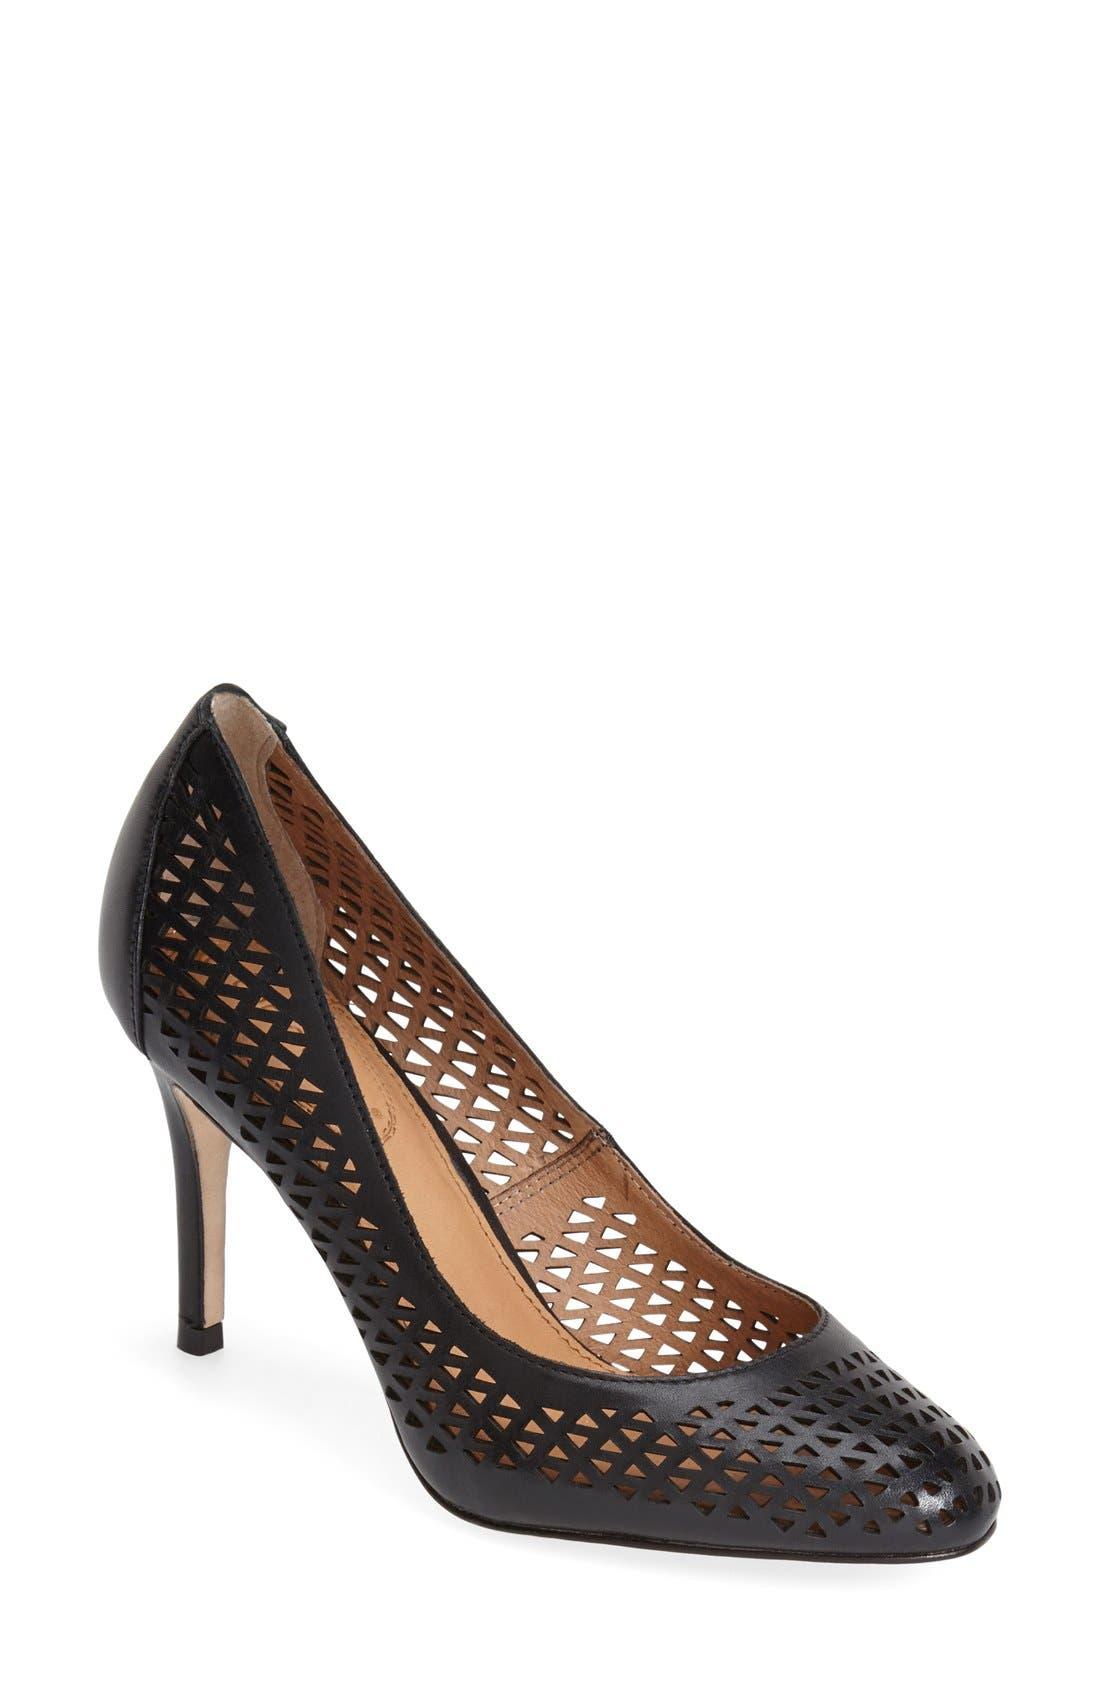 Main Image - Corso Como 'Wanda' Perforated Leather Pump (Women)